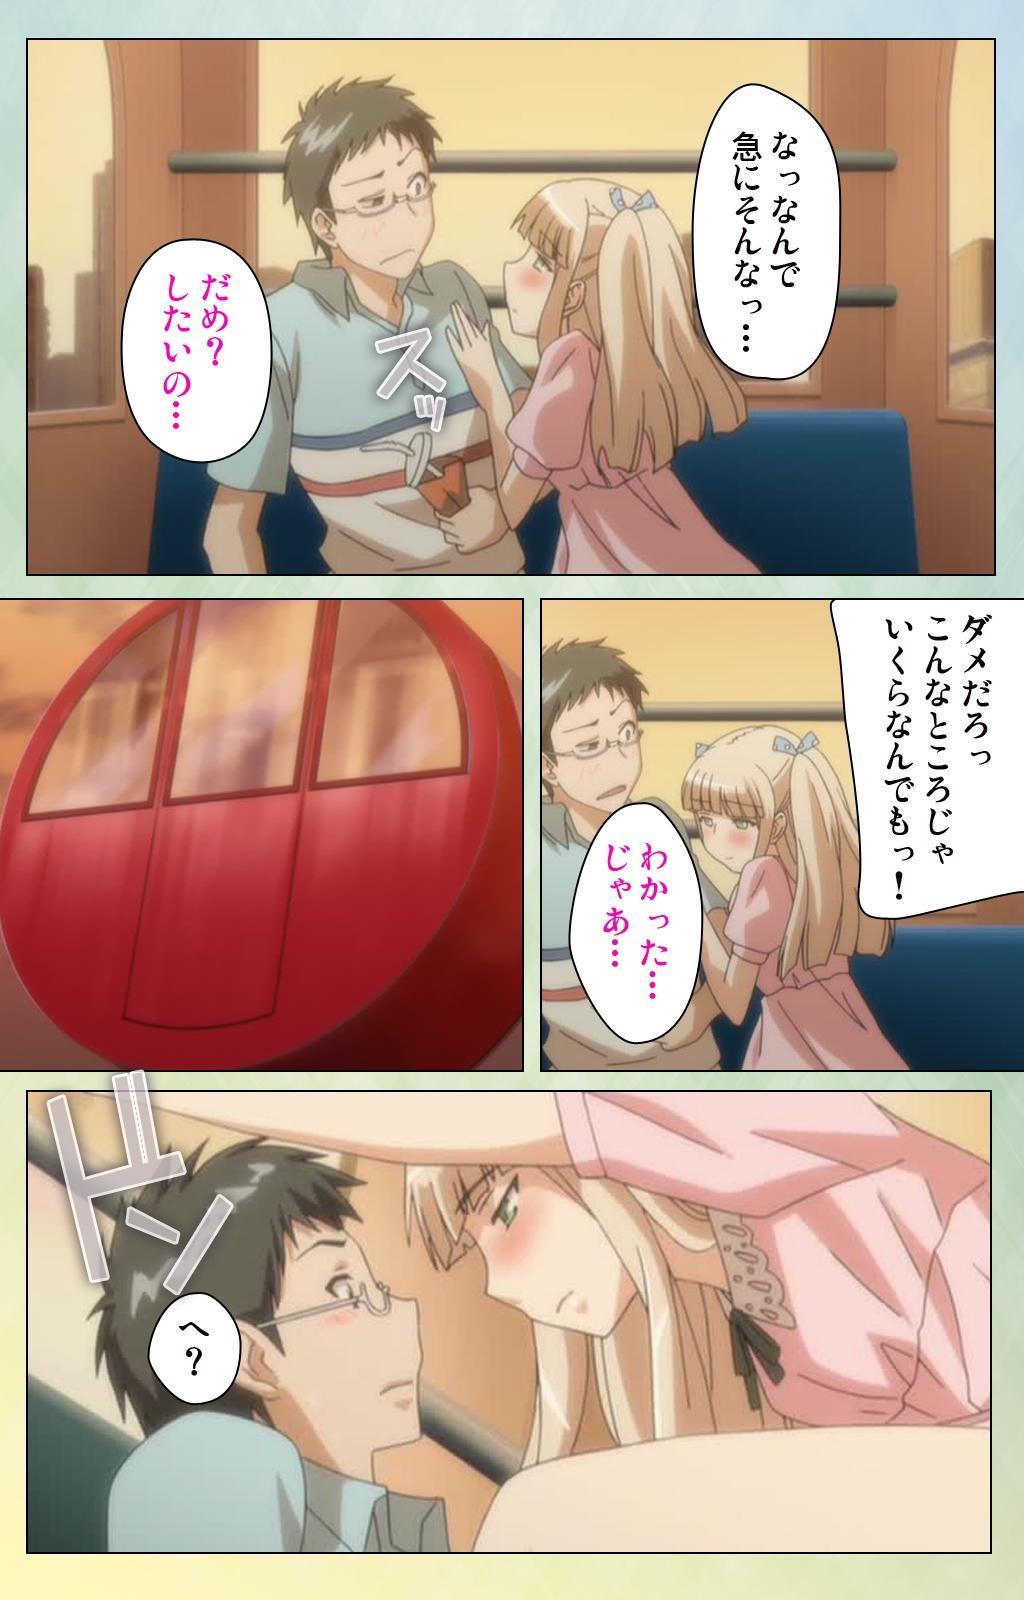 Furueru Kuchibiru fuzzy lips1 Complete Ban 56